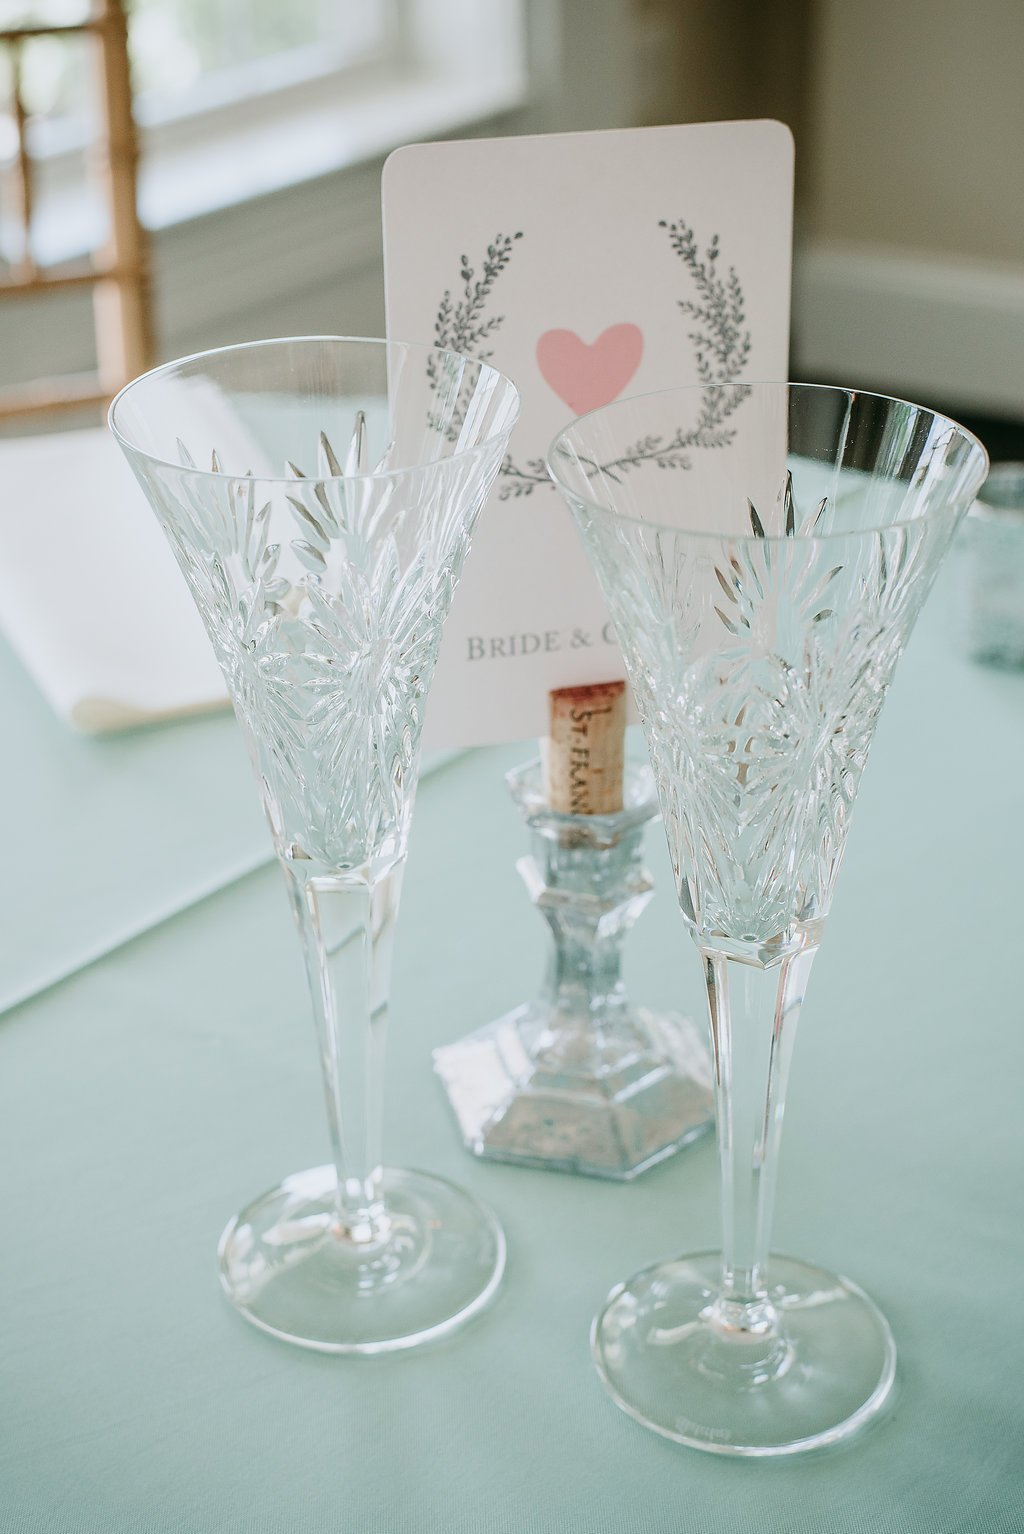 DC Wedding Planner| Lavish Creations by Tiffany| Washington D.C.